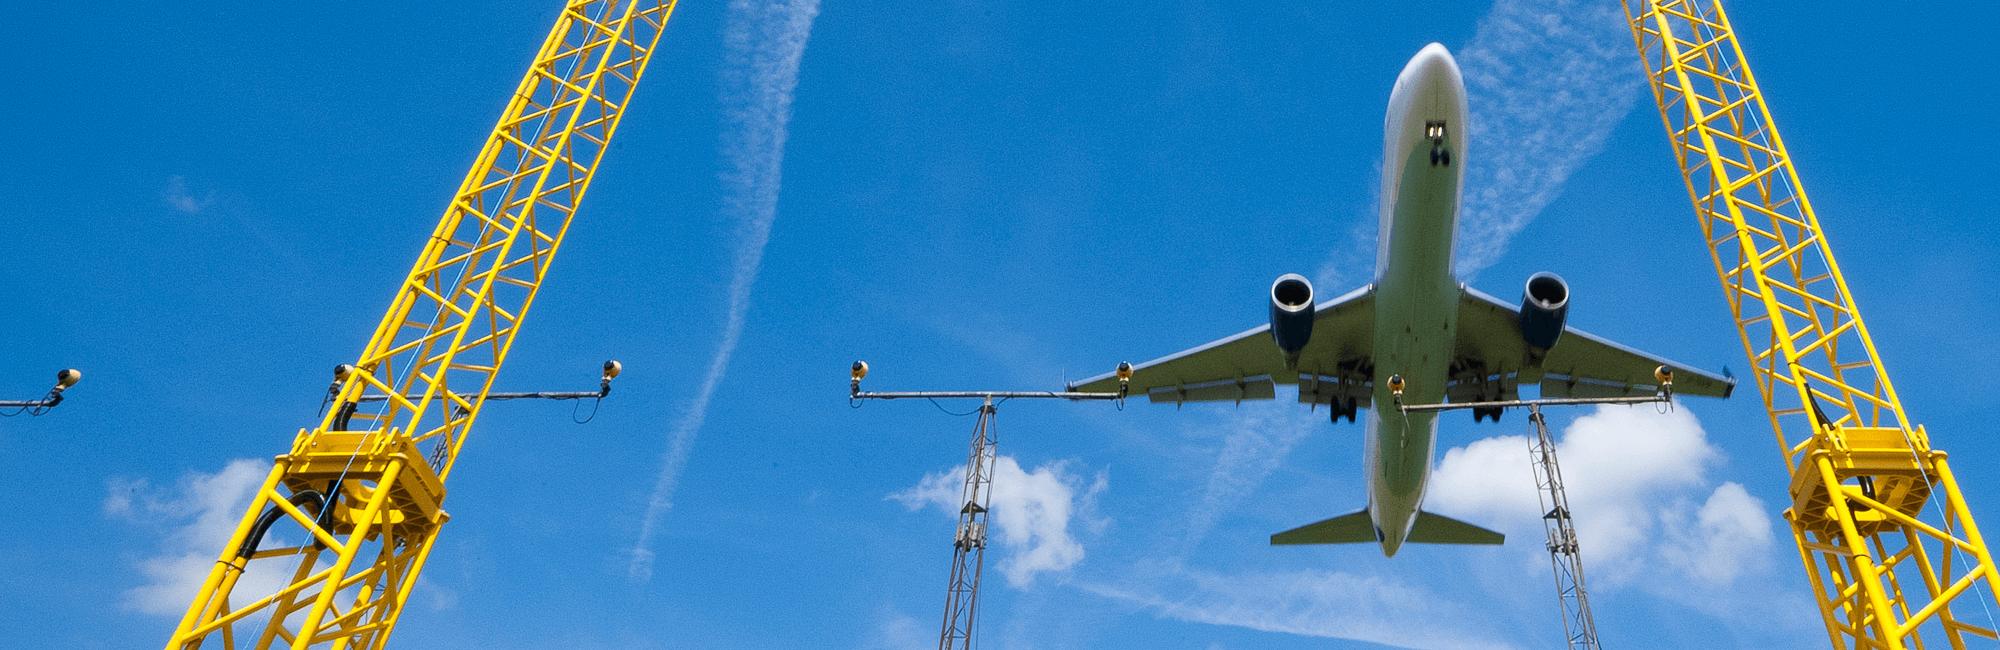 atg-airports-homepage